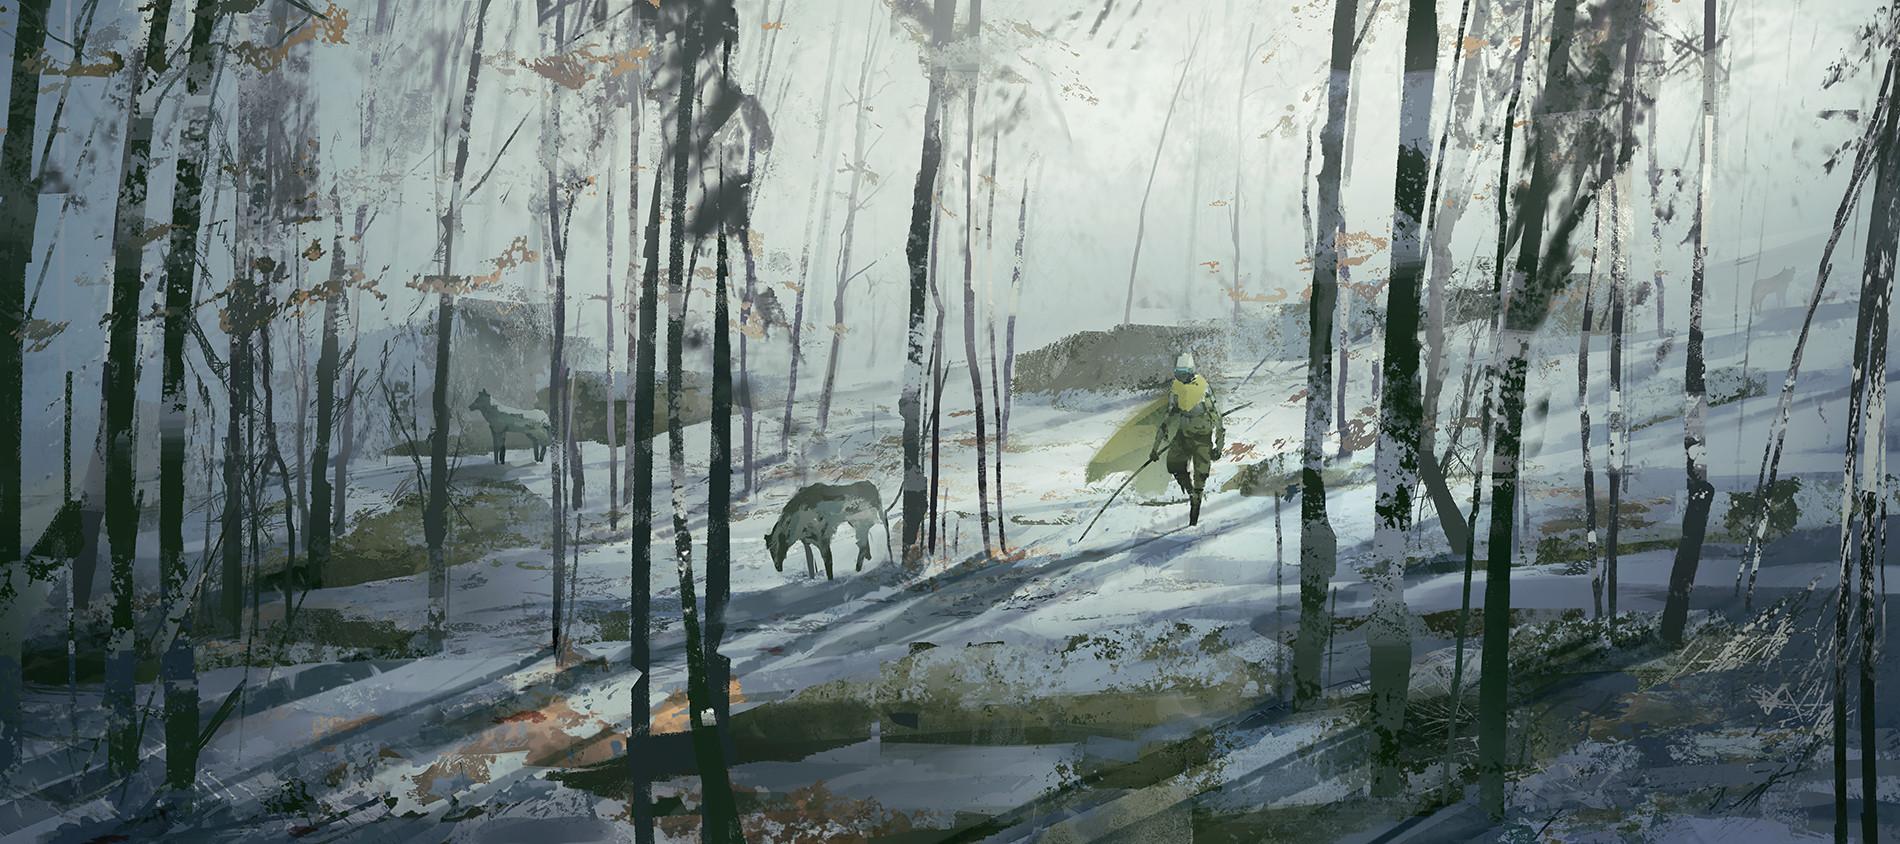 Jaromir hrivnac 20181110 forest2